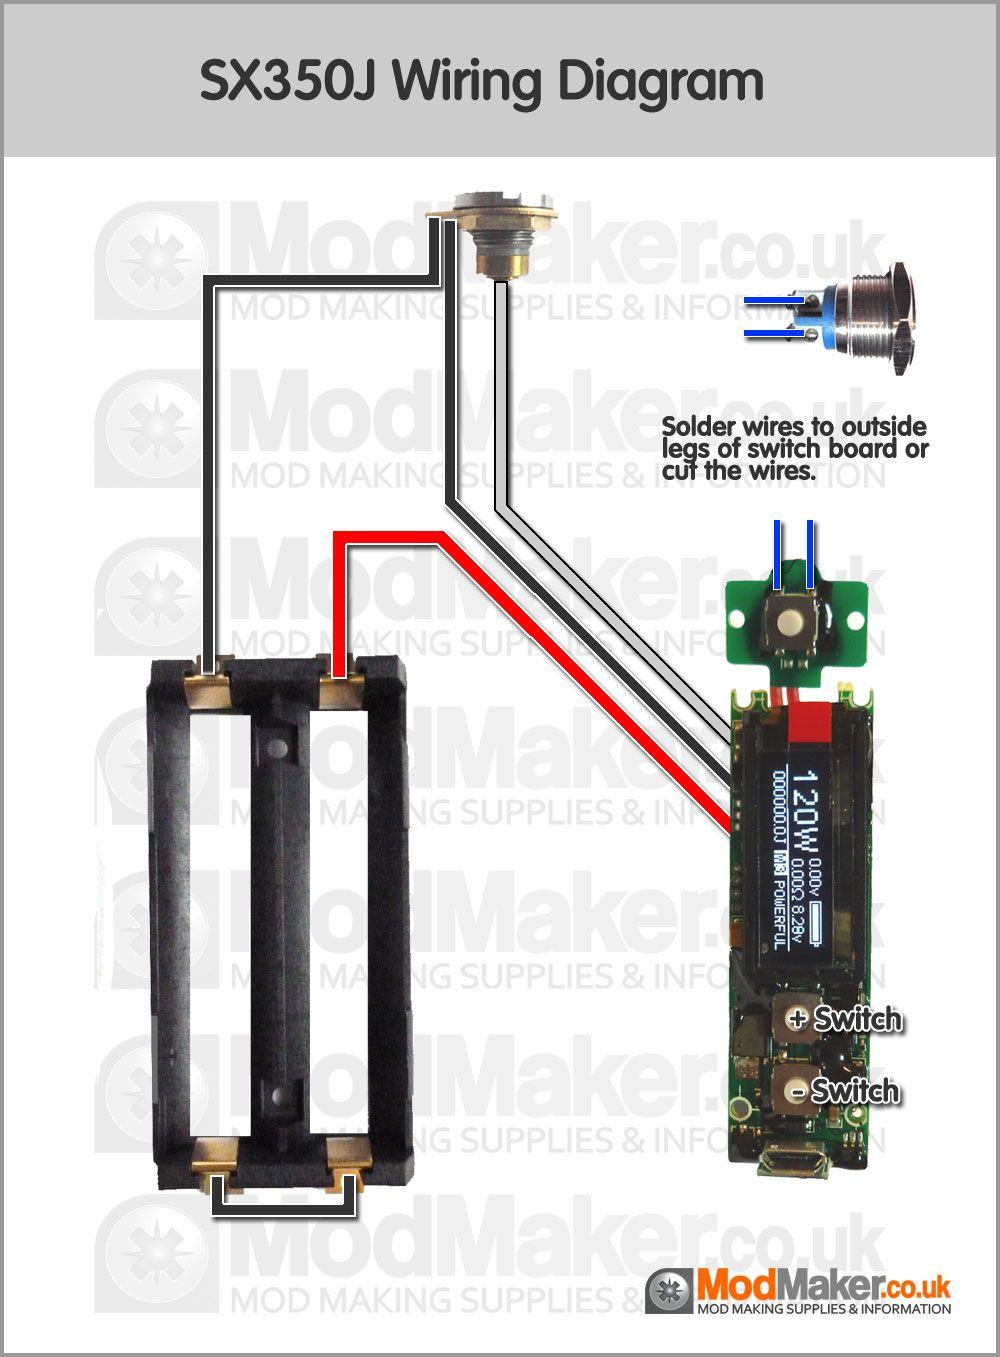 SX350J Wiring Diagram | MOD BOX | Vape diy, Smok vape i